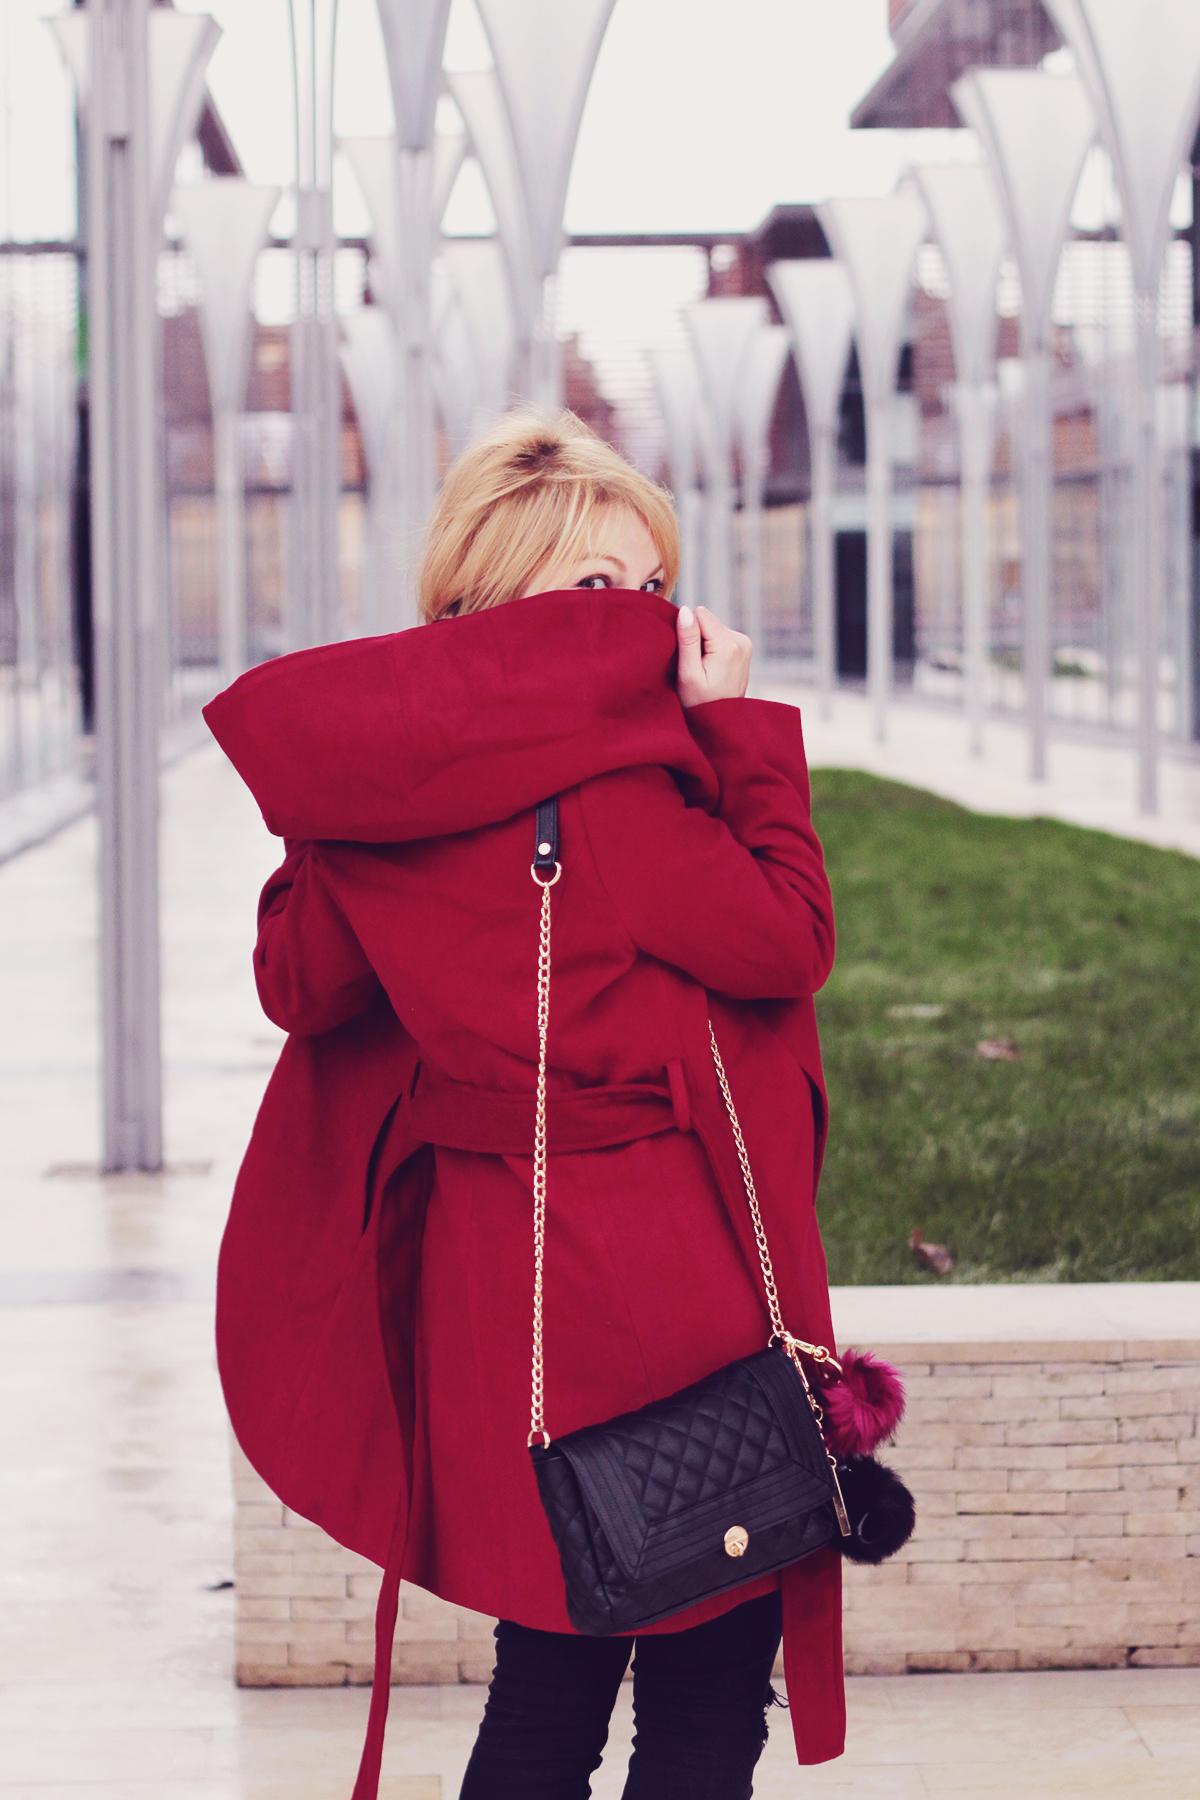 the burgundy coat